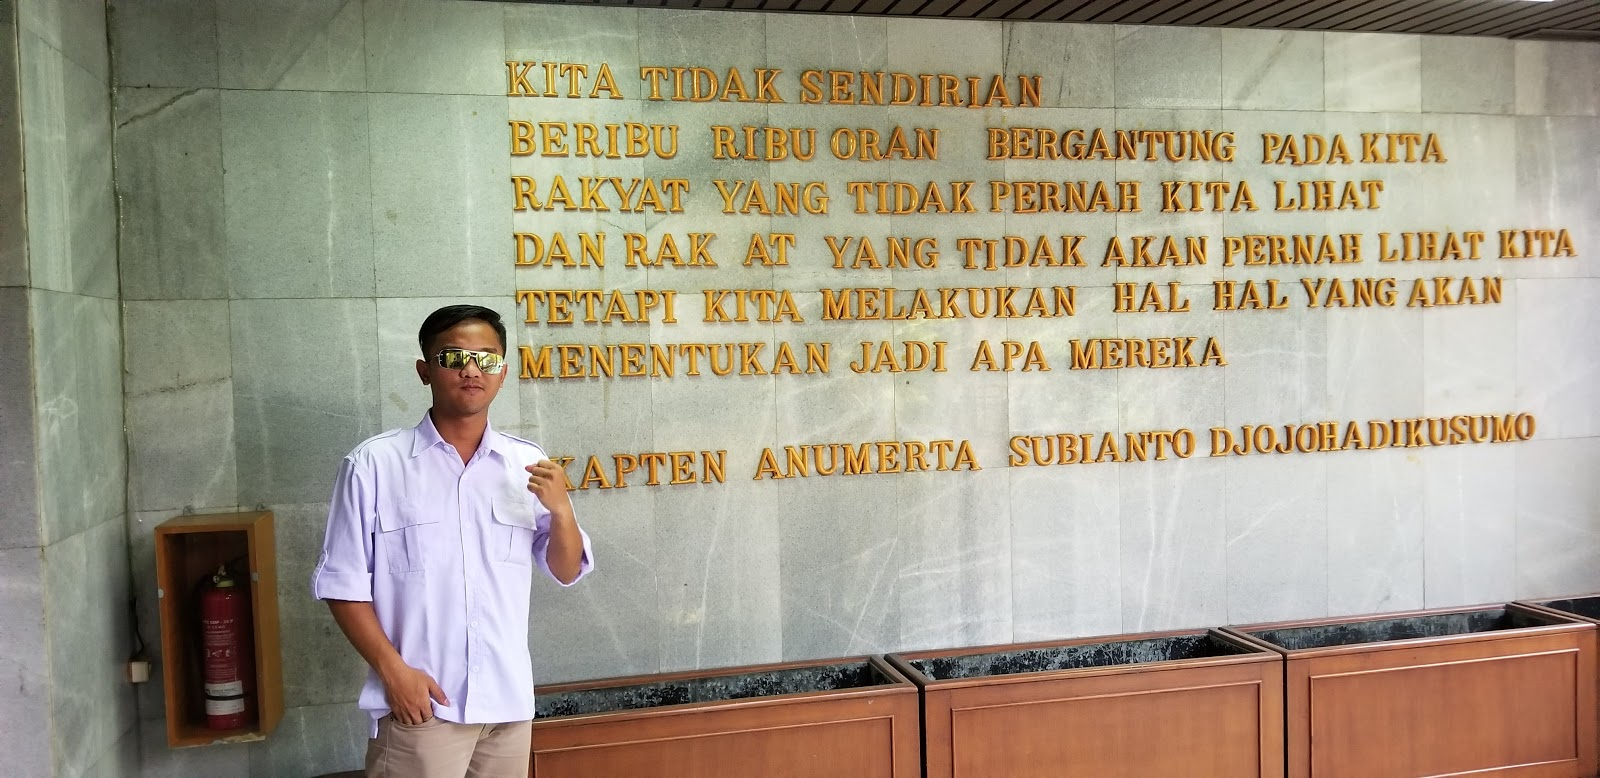 Kapten Anumerta Subianto Djojohadikusumo